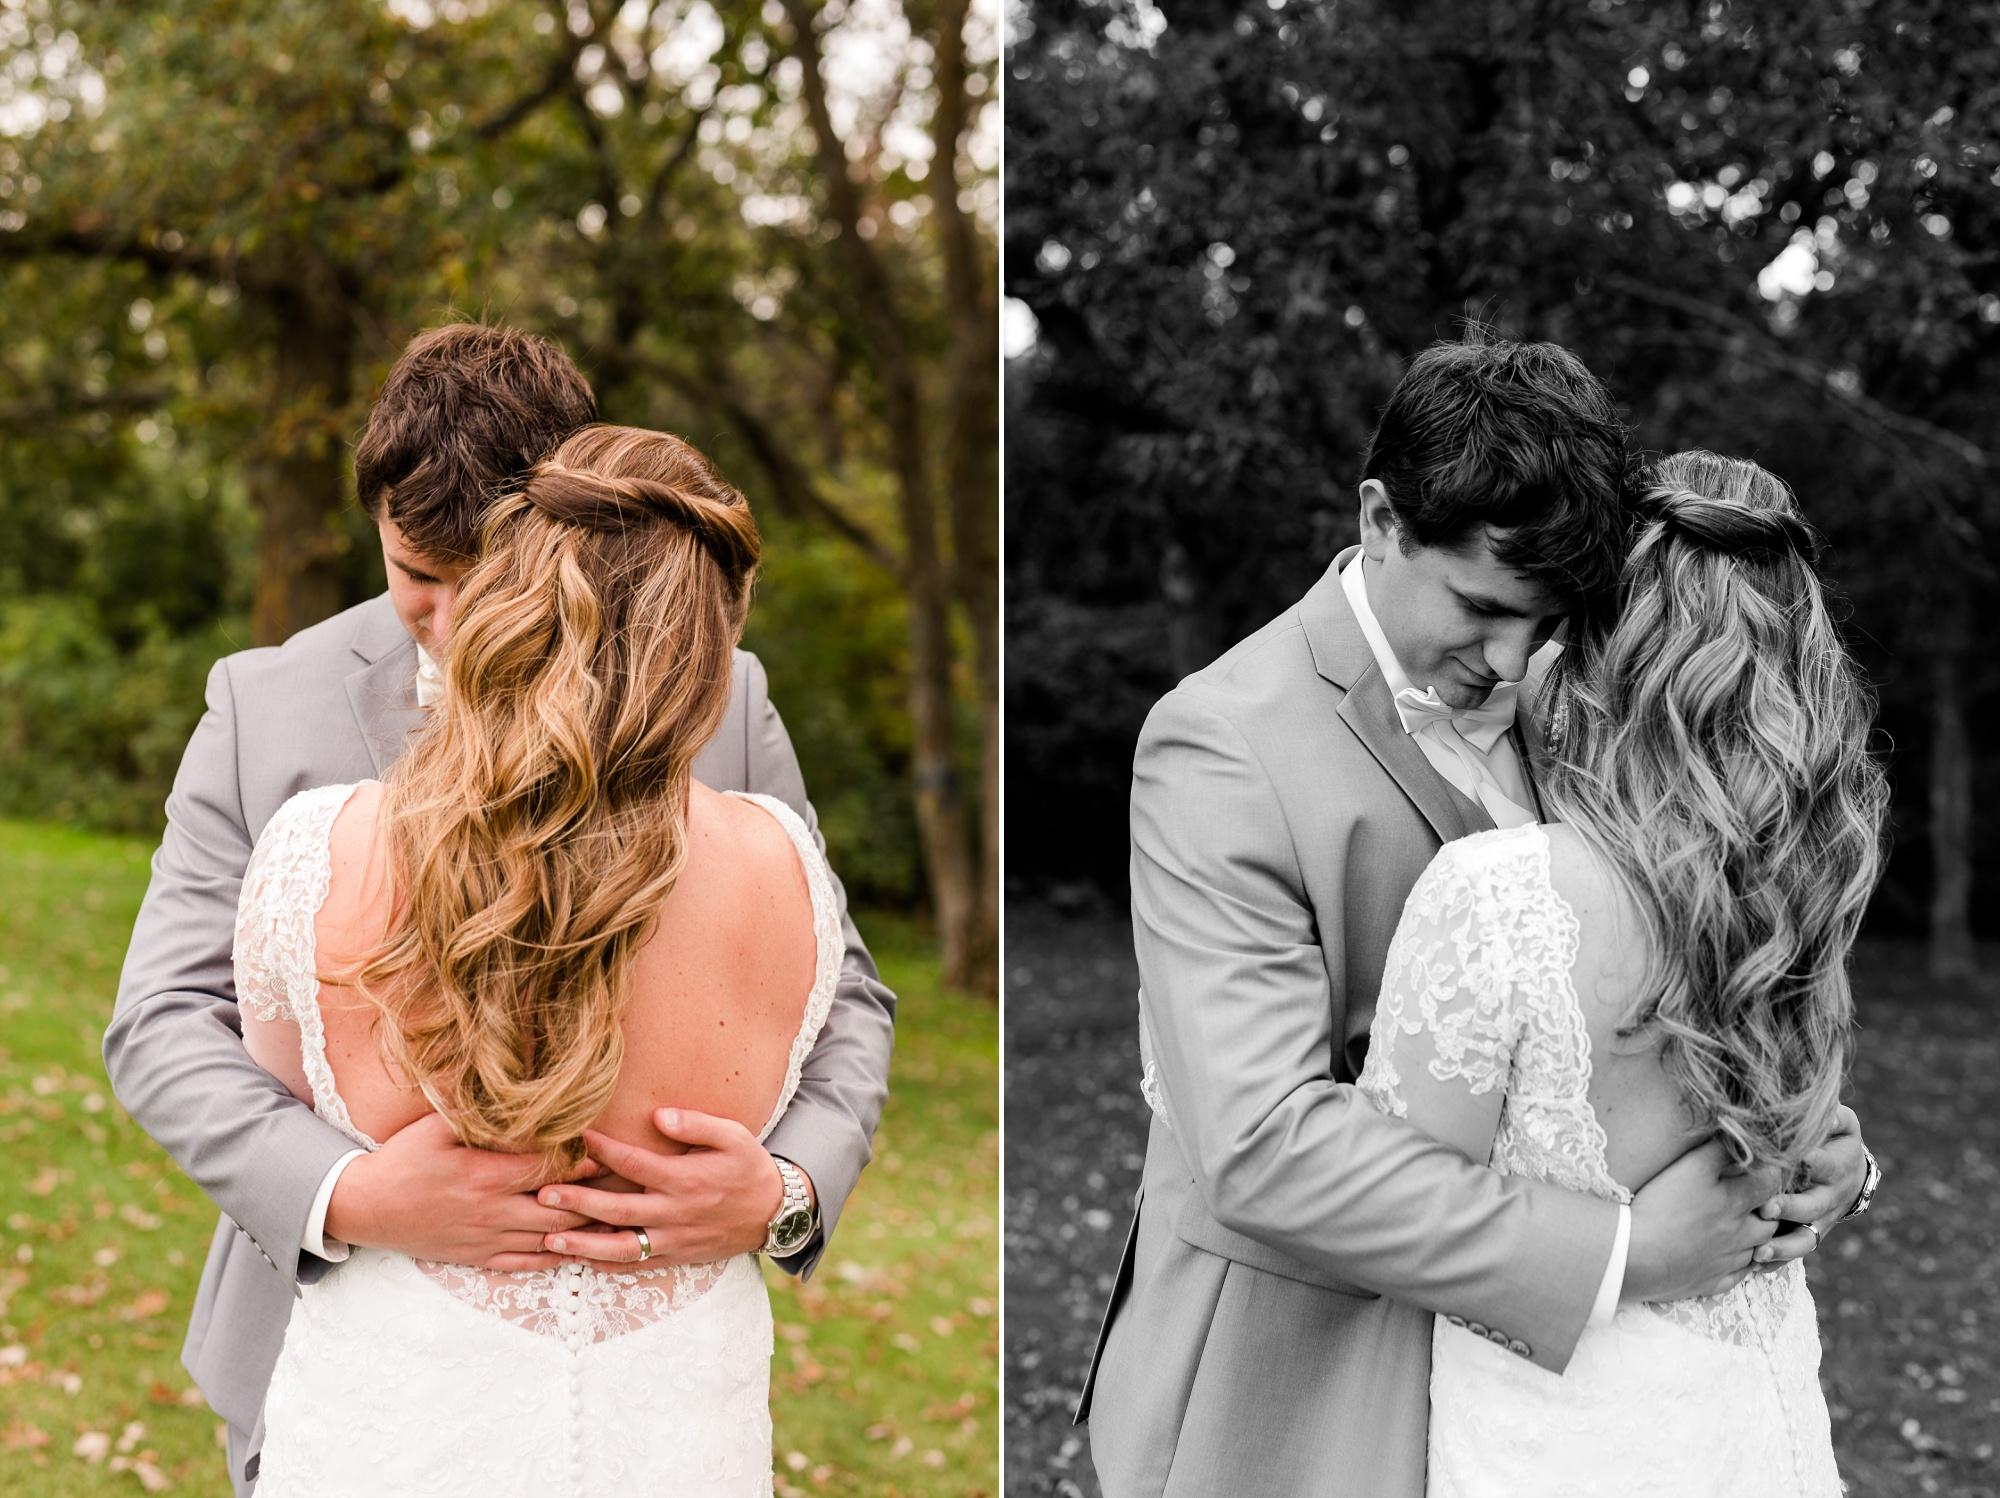 AmberLangerudPhotography_Fair Hills Resort Lakeside Wedding in Minnesota_3437.jpg